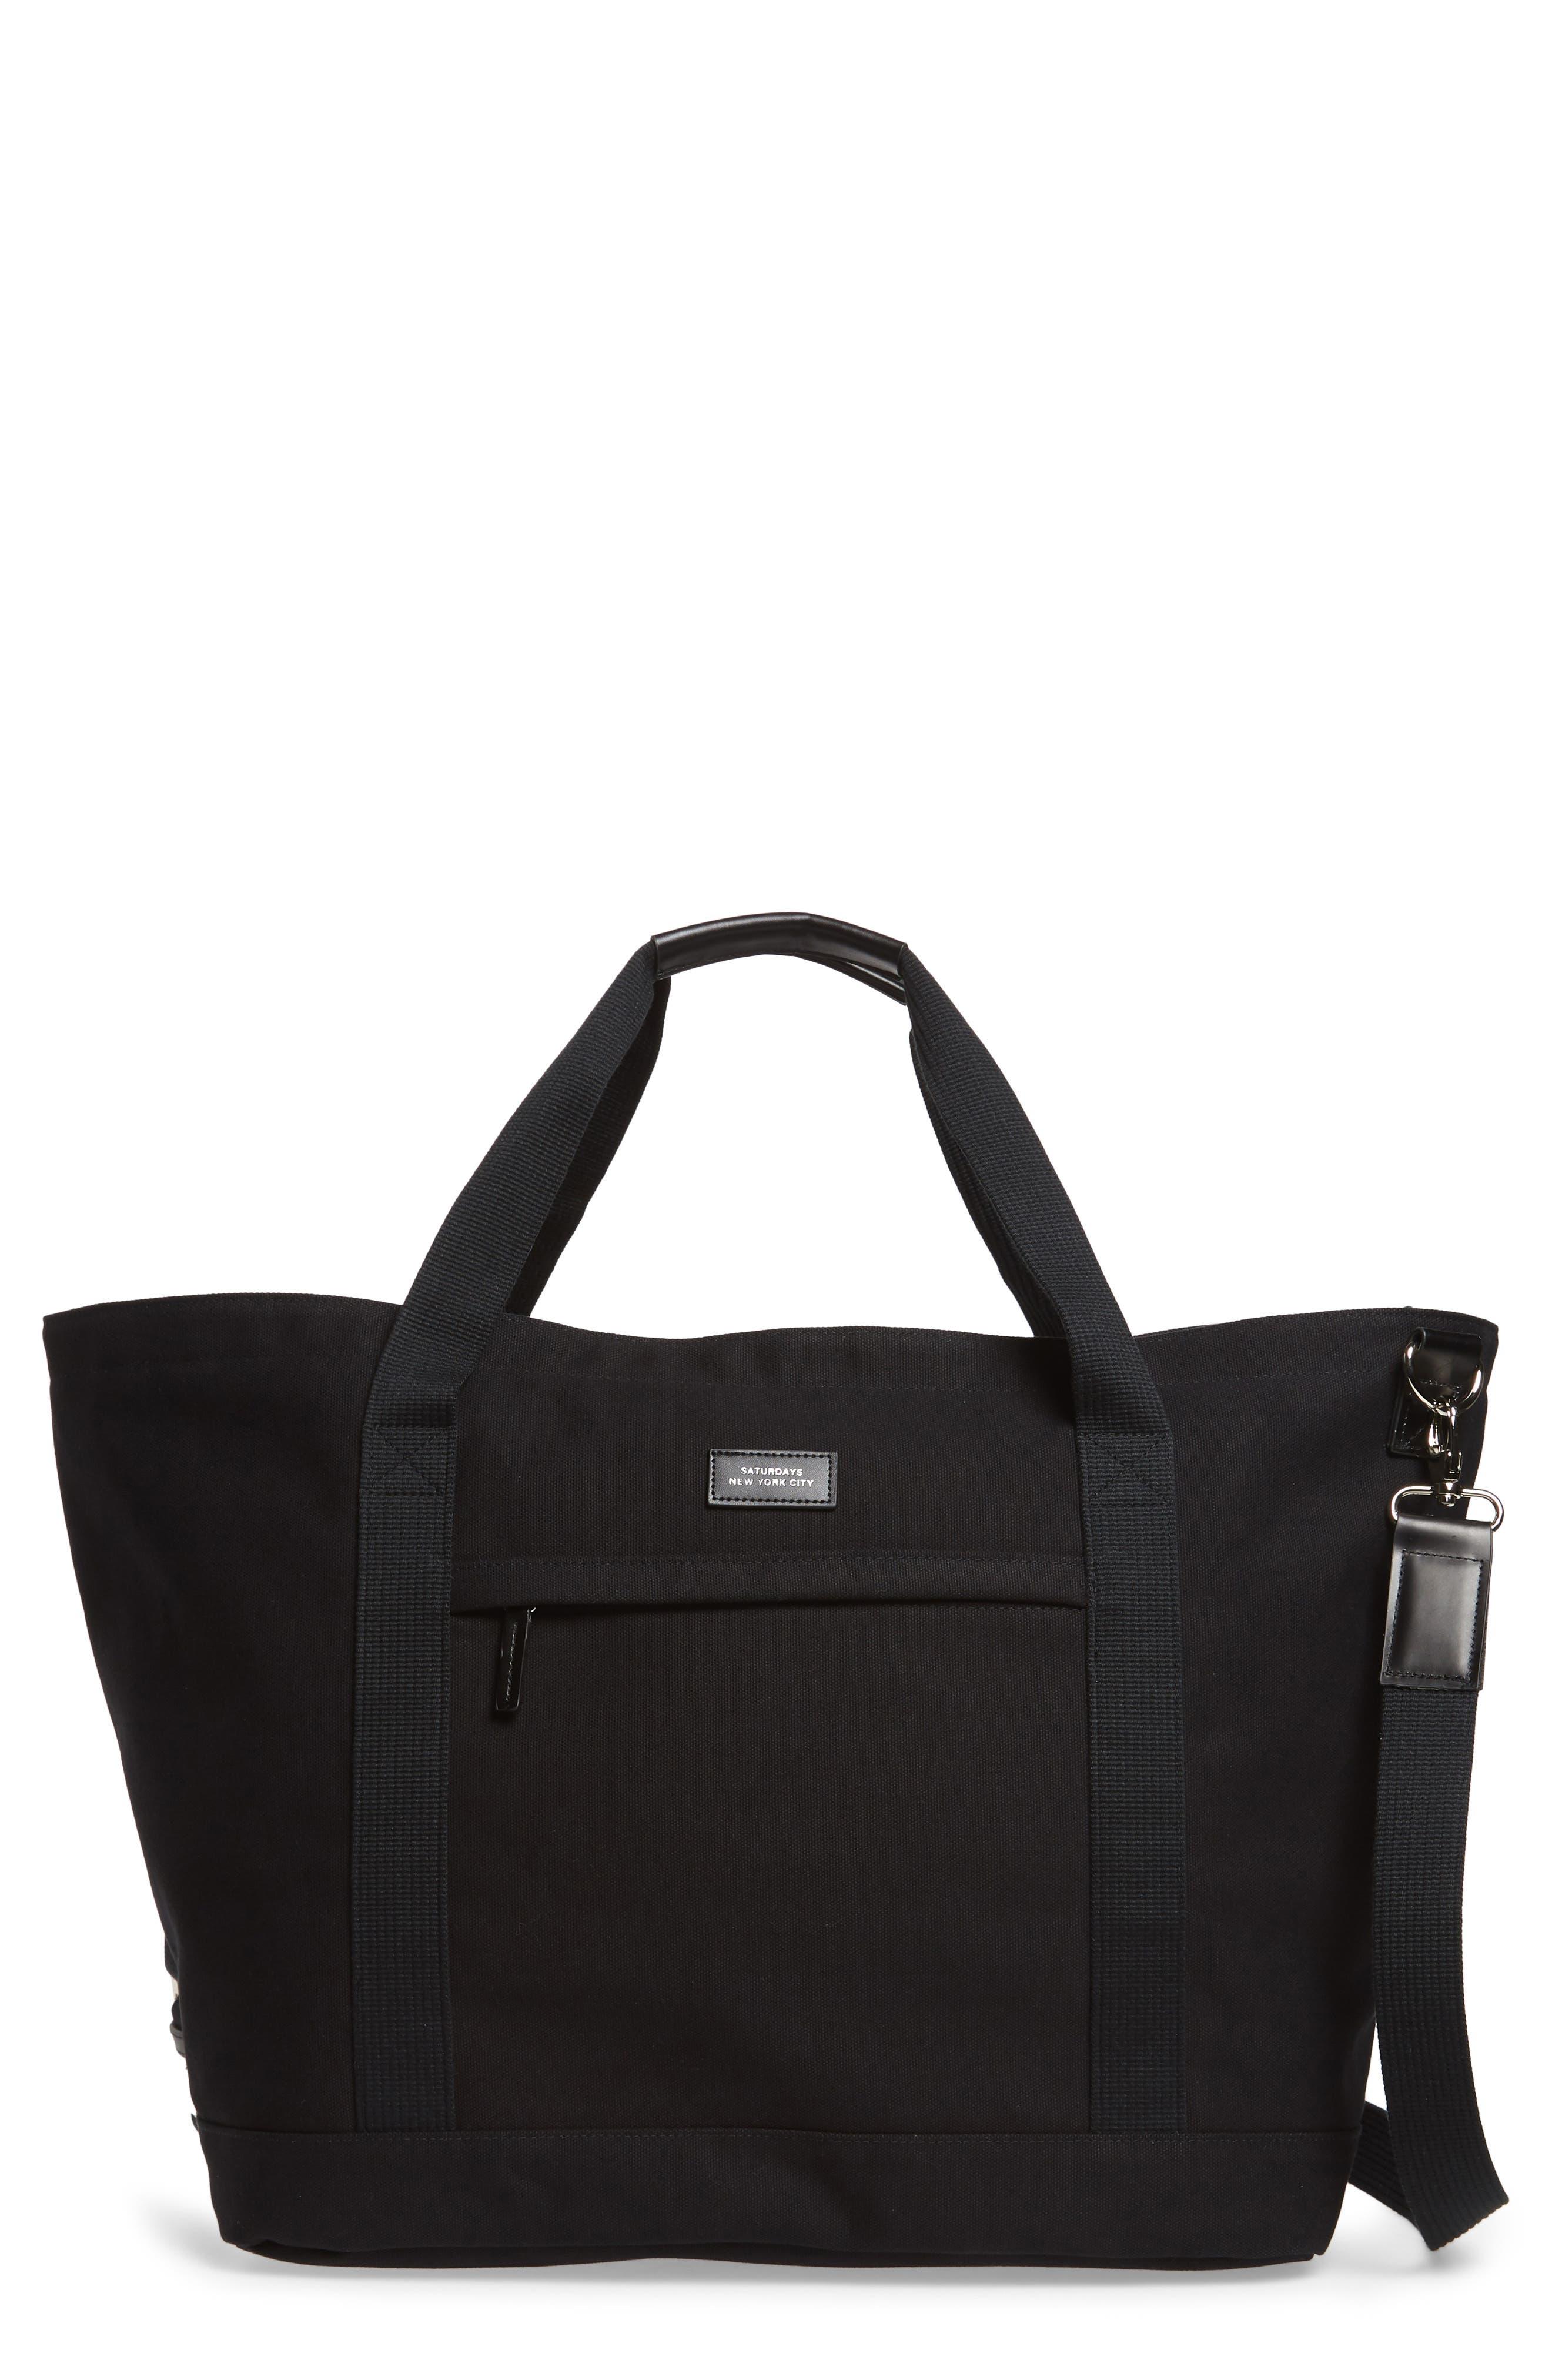 Weekend Water Repellent Tote Bag,                         Main,                         color, Black